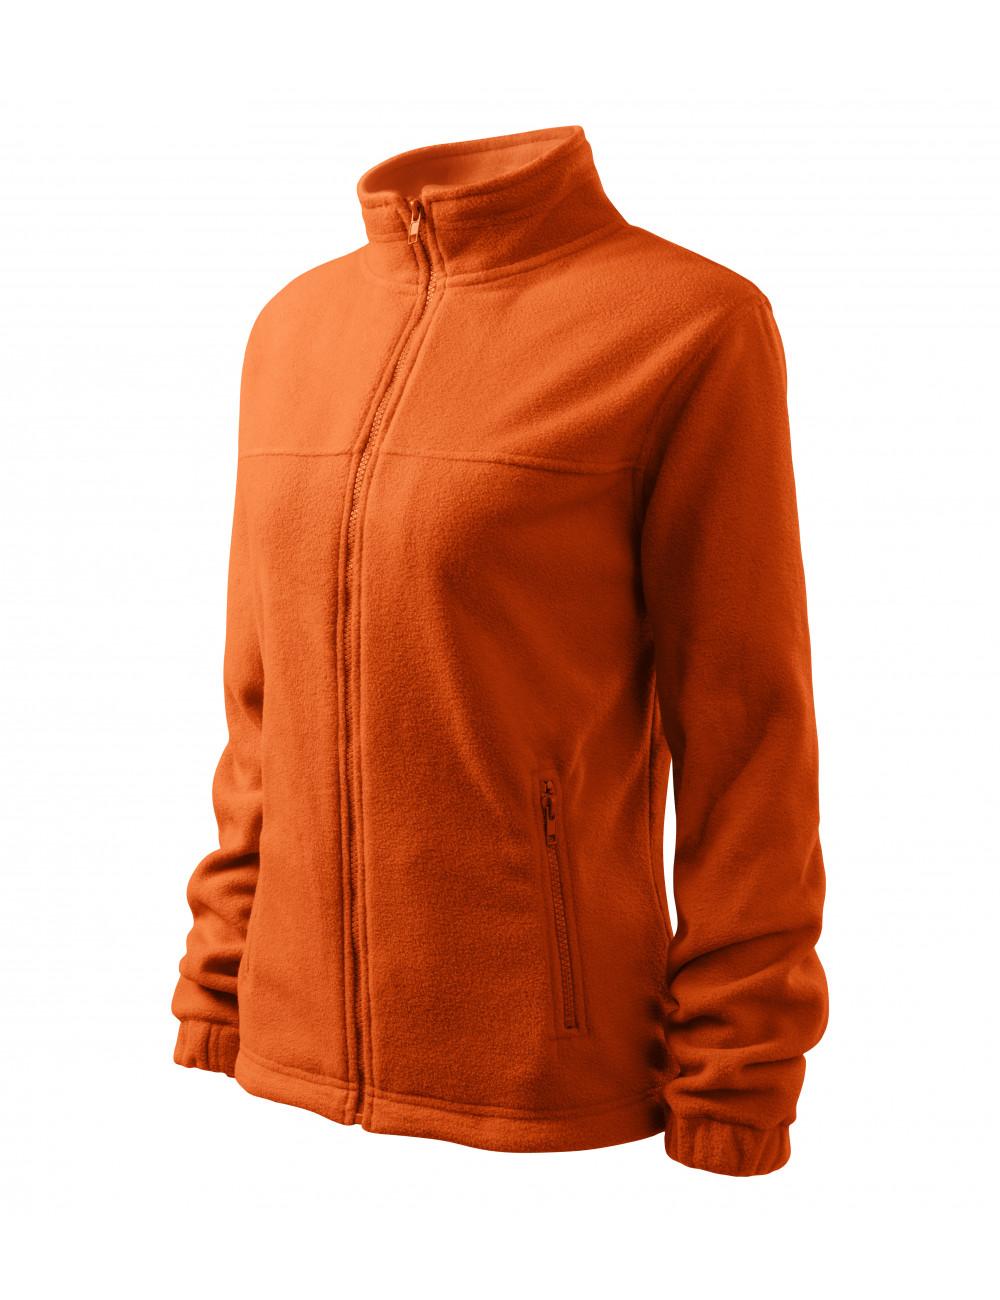 Adler RIMECK Polar damski Jacket 504 pomarańczowy